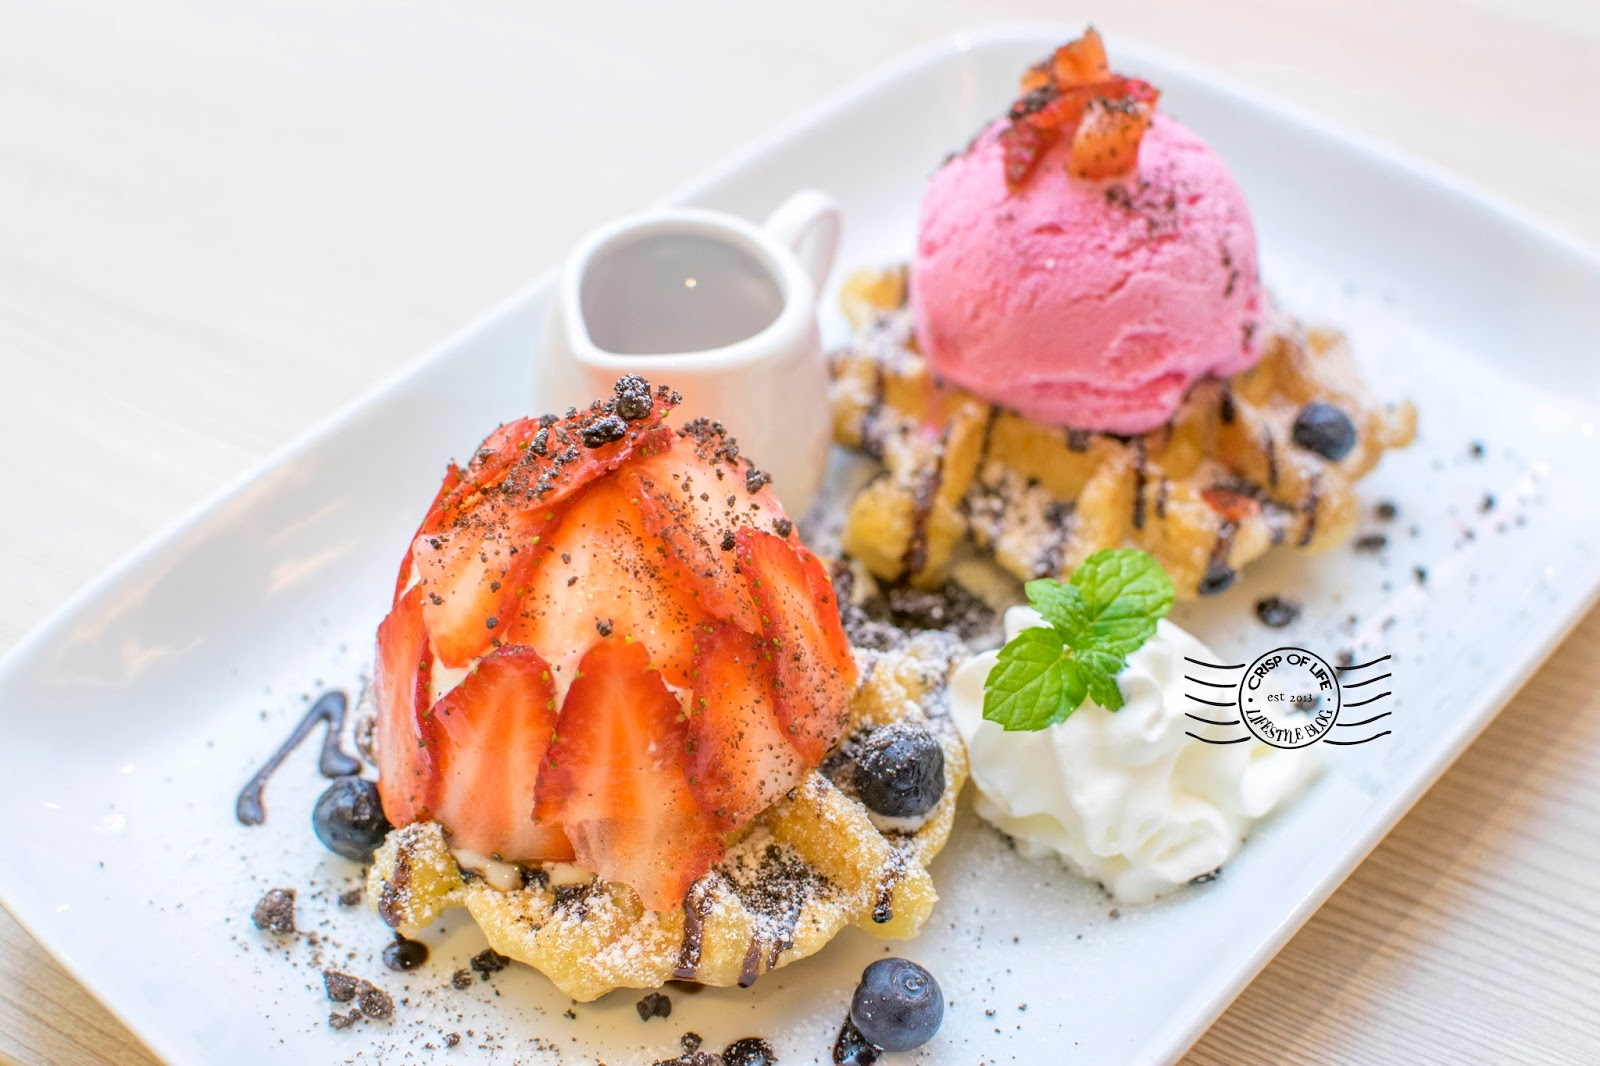 Mellowcup Cafe @ Jalan Gottlieb, Georgetown, Penang